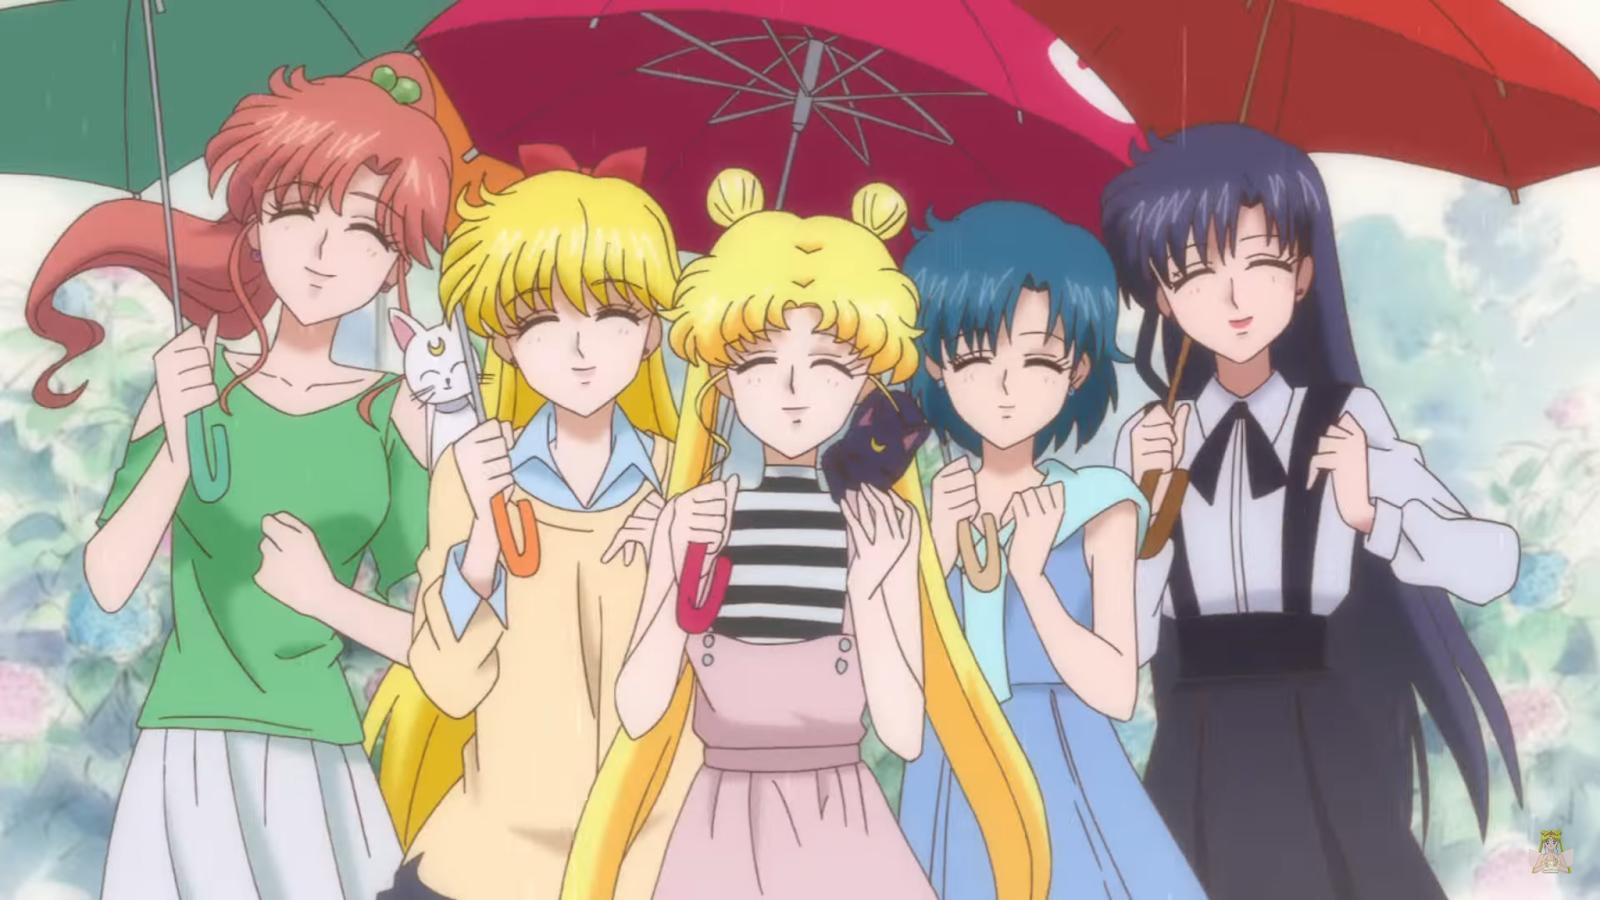 [OOTD / INSPIRED LOOK] Usagi Tsukino In Sailor Moon Crystal First Season Opening Song (Moon Pride) Kawaii Hijabi Sheema Sherry Hijab Fashion Tokyo Harajuku Shibuya Bandai Japan Otome Kei Aomoji Kei Moehara